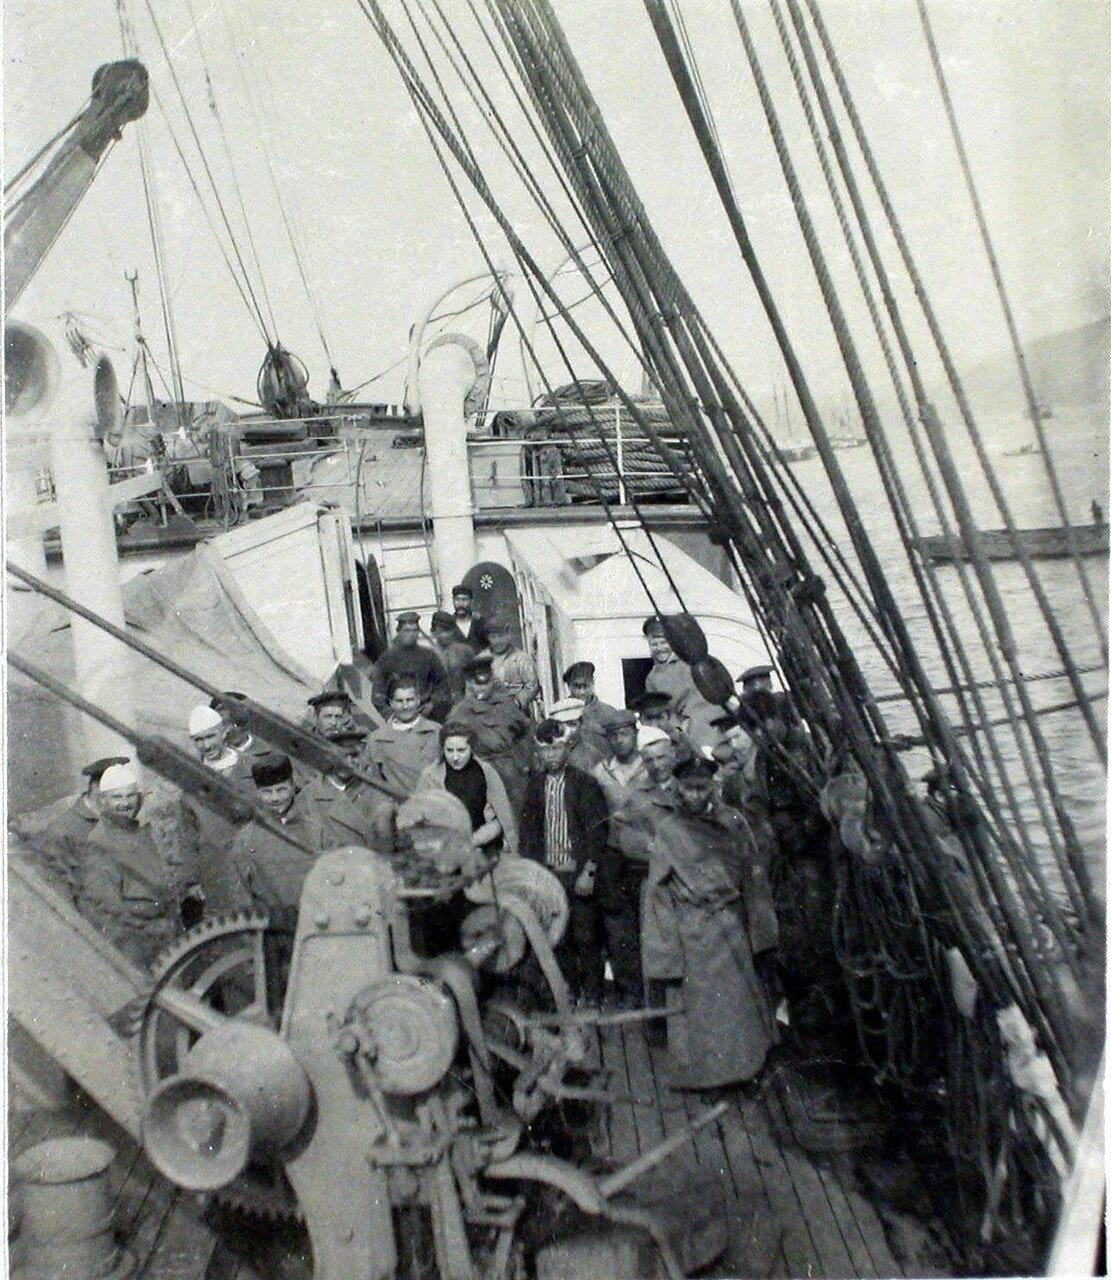 33. Больные на палубе парохода «Царица». Япония, Иокогама. 1901